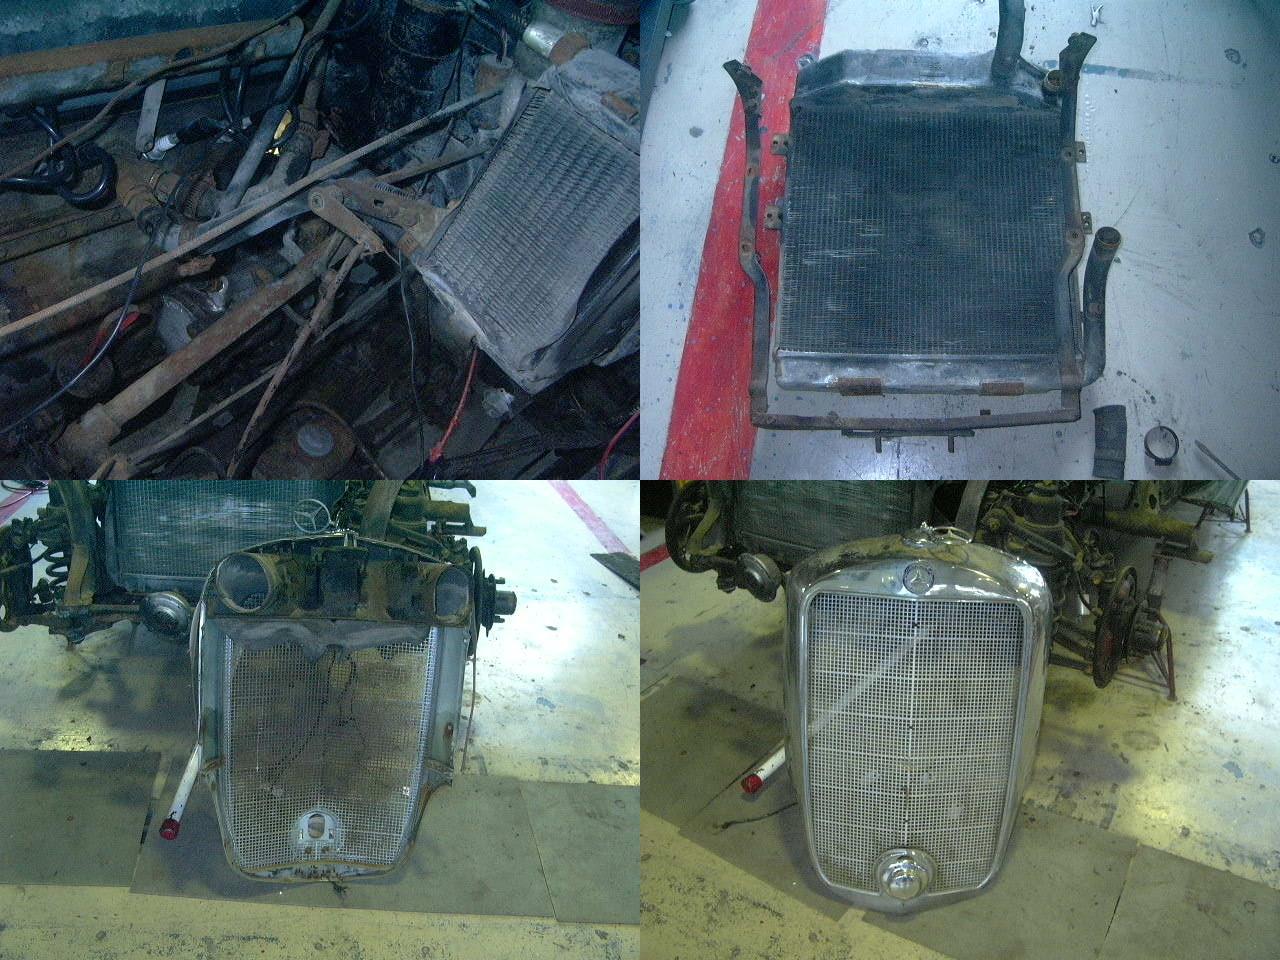 http://nakanemotors.com/blog/restore/MB220/P1060608-tile.jpg